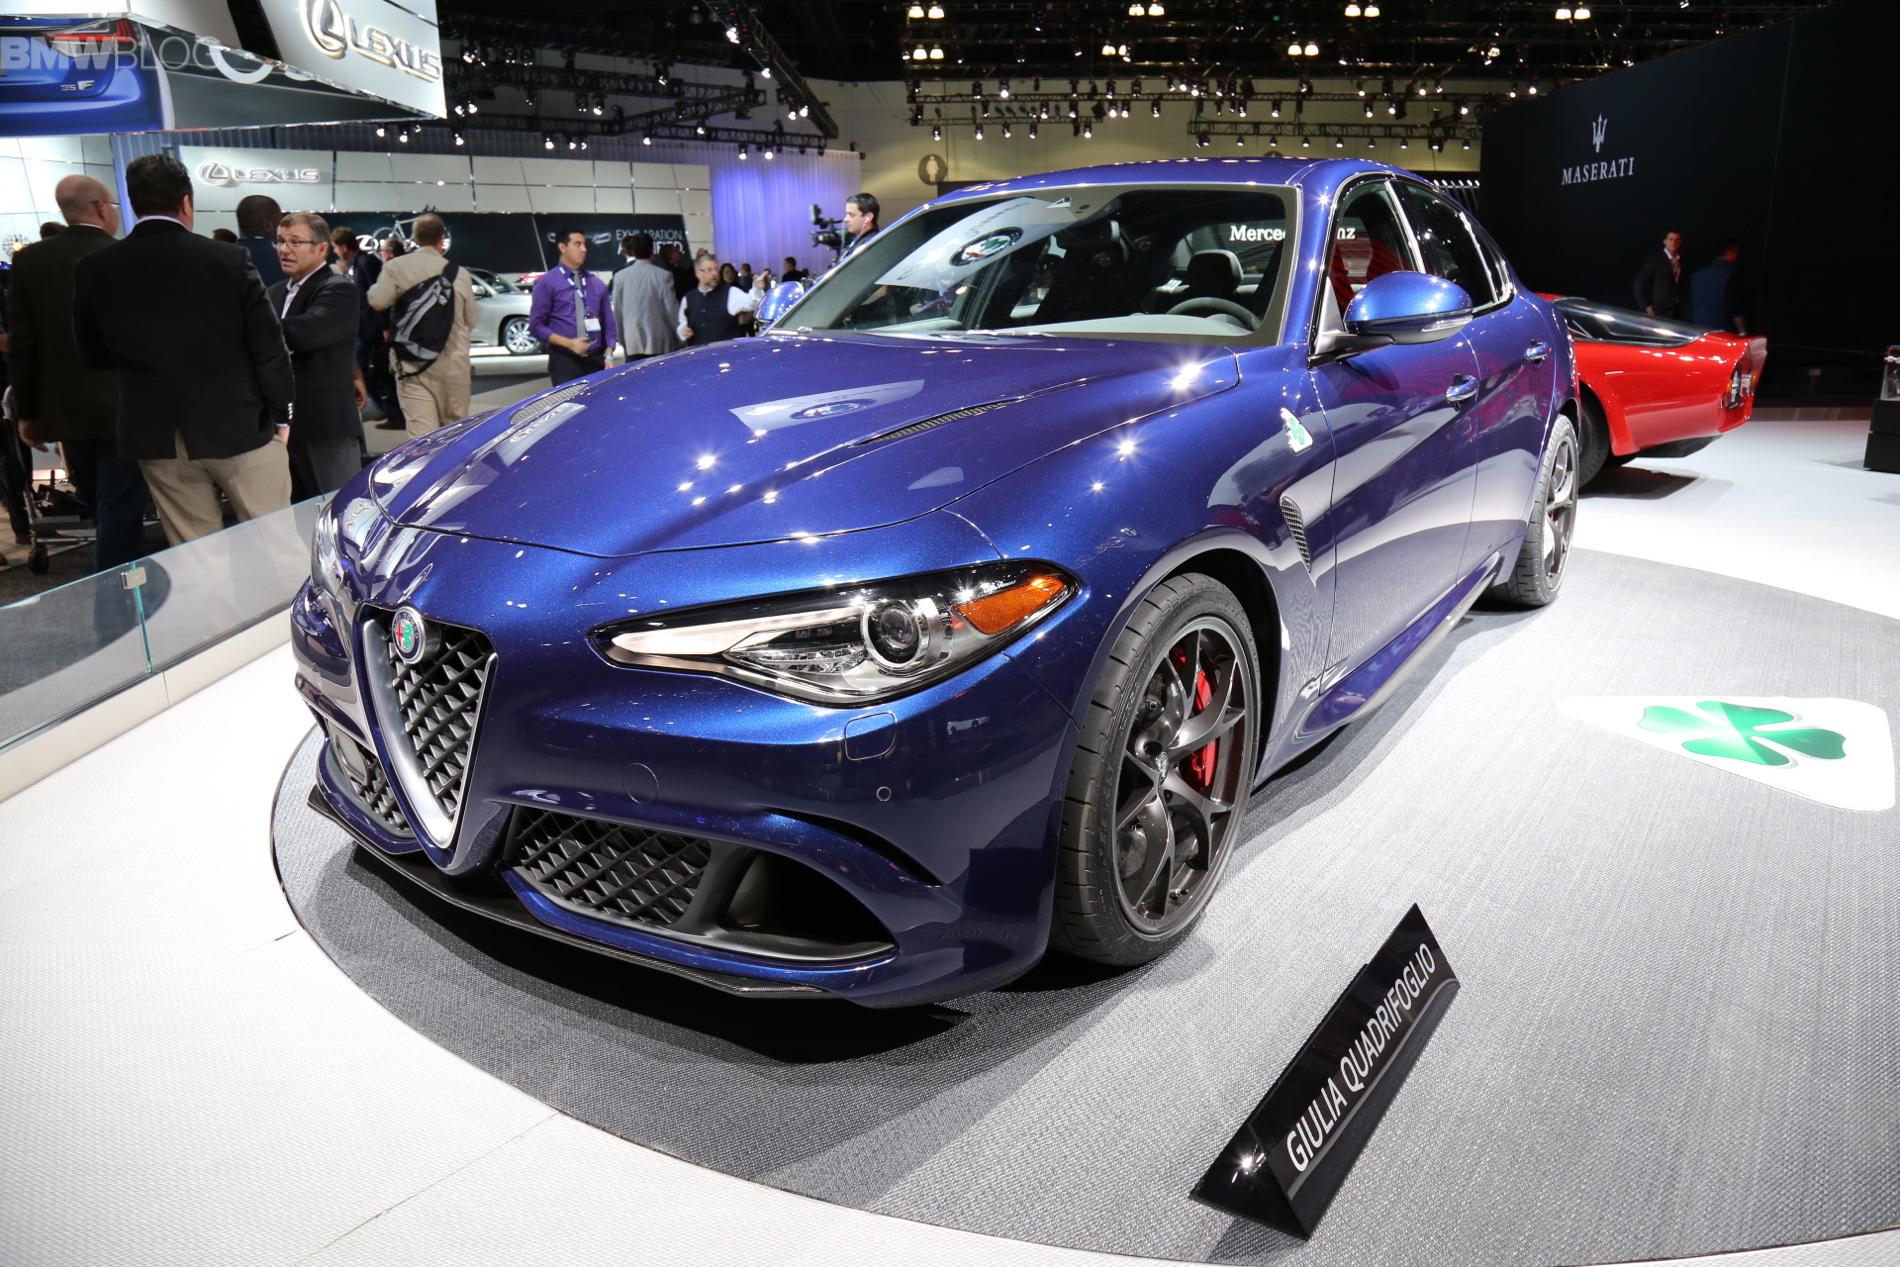 Alfa Romeo Giulia 2015 LA Auto Show 1